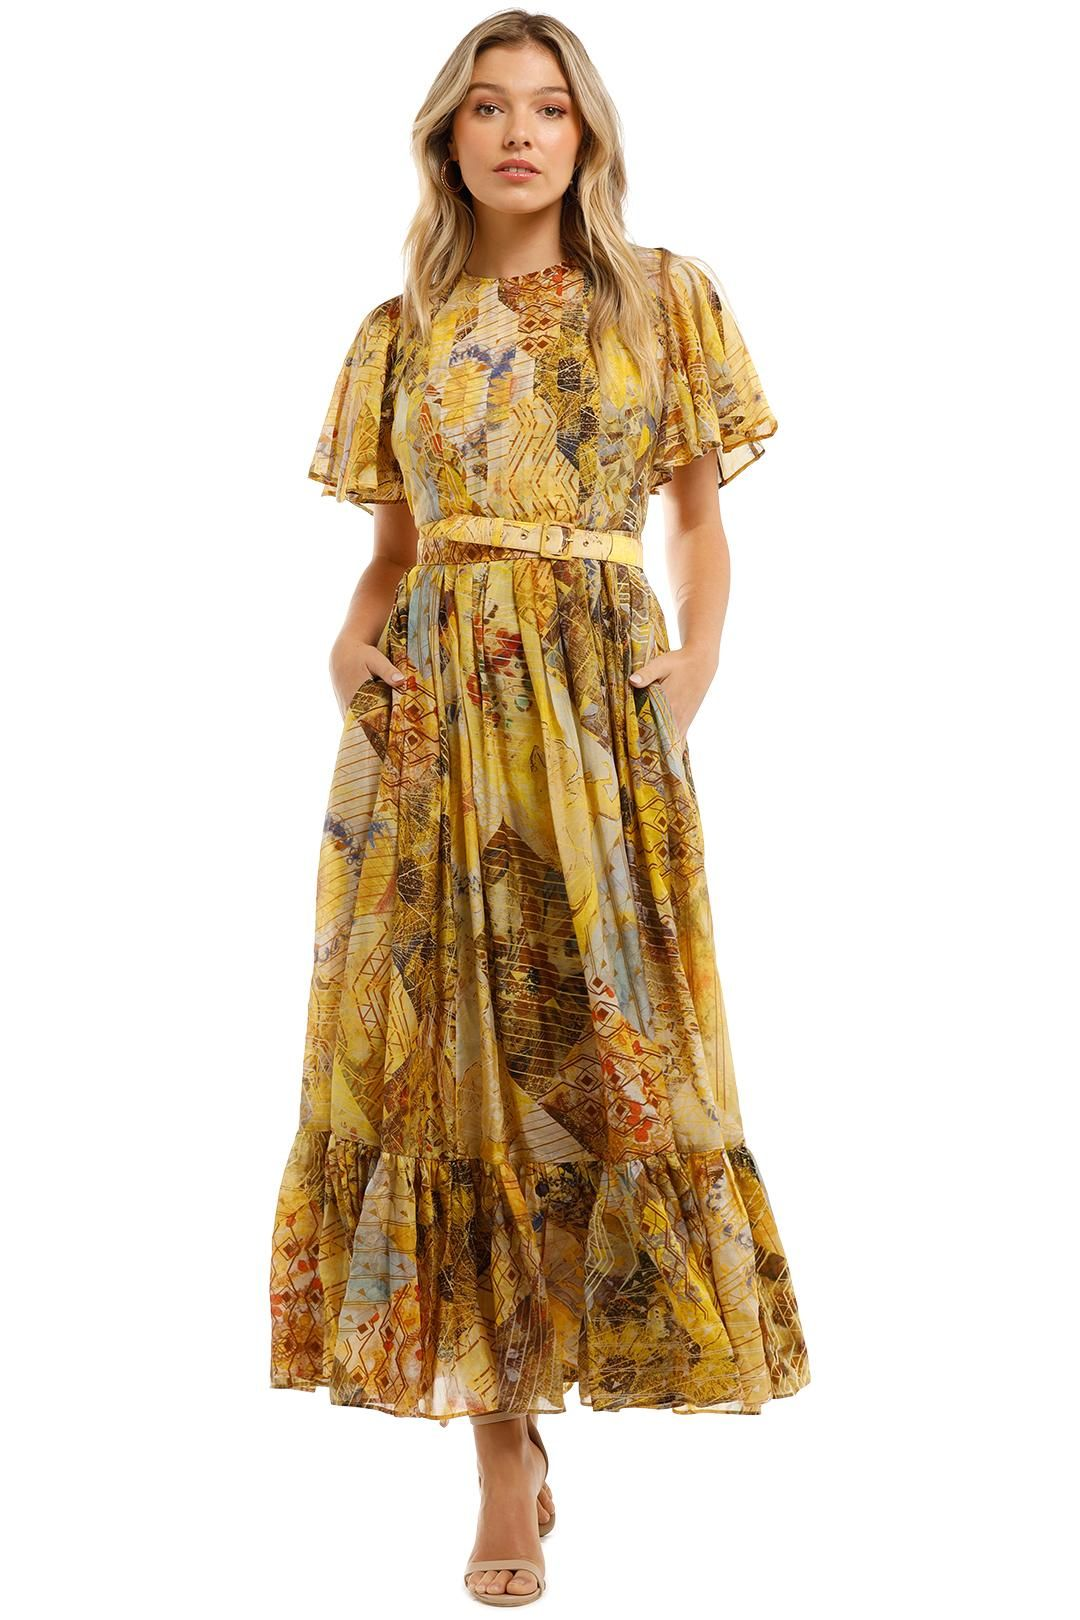 Leo and Lin Illusory Silk Cotton Dress Maxi Print